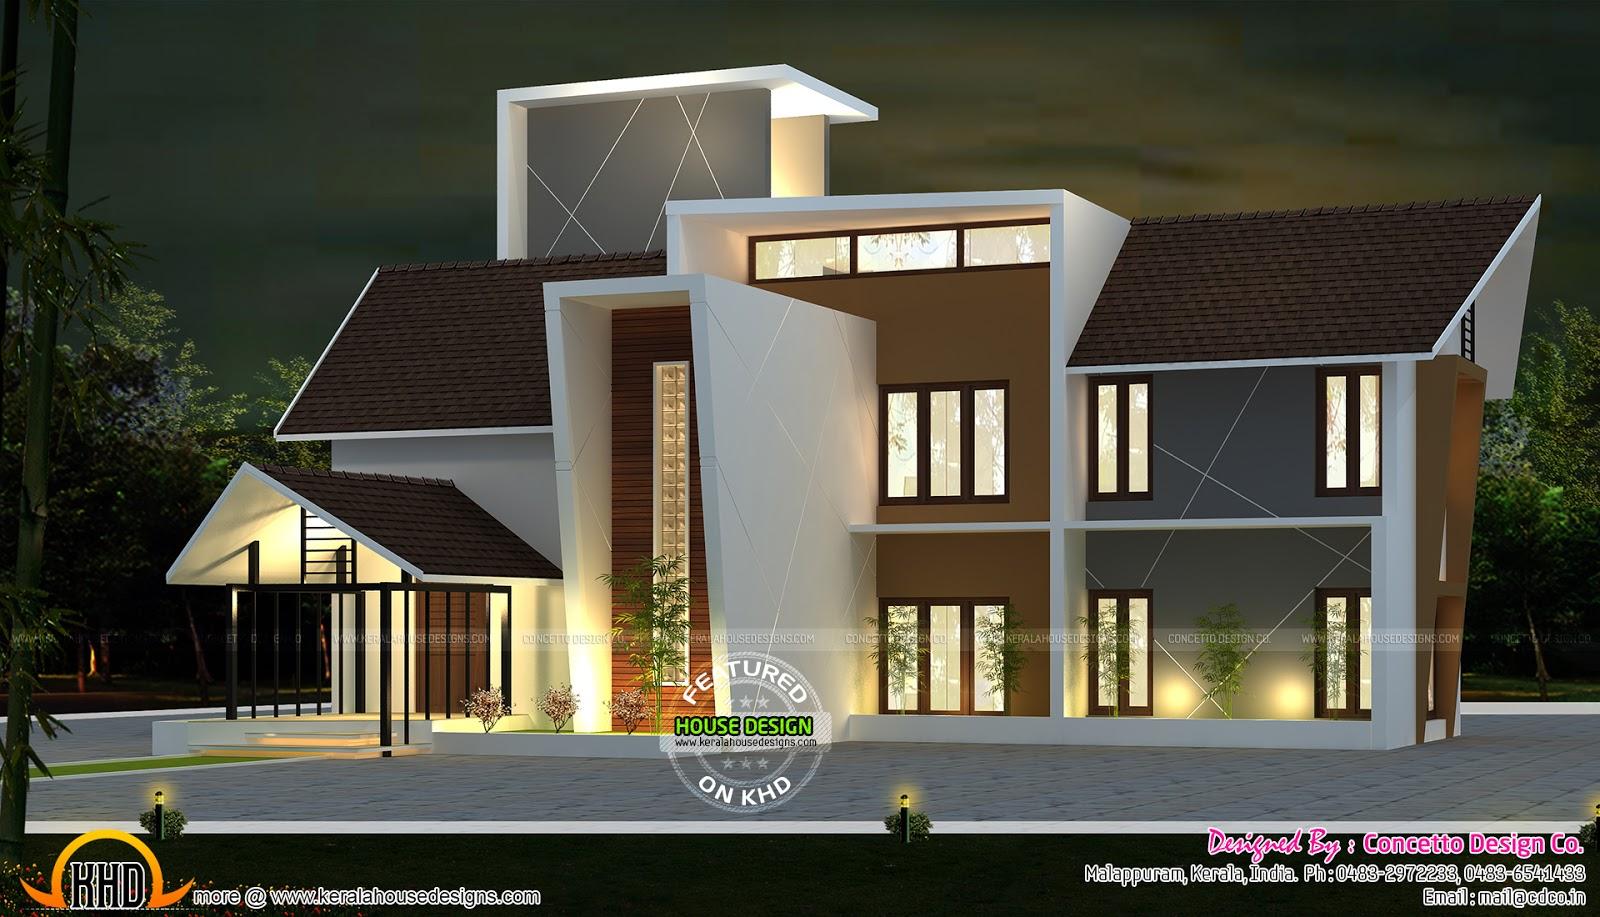 Modern Villa In 2814 Sq Ft Kerala Home Design And Floor